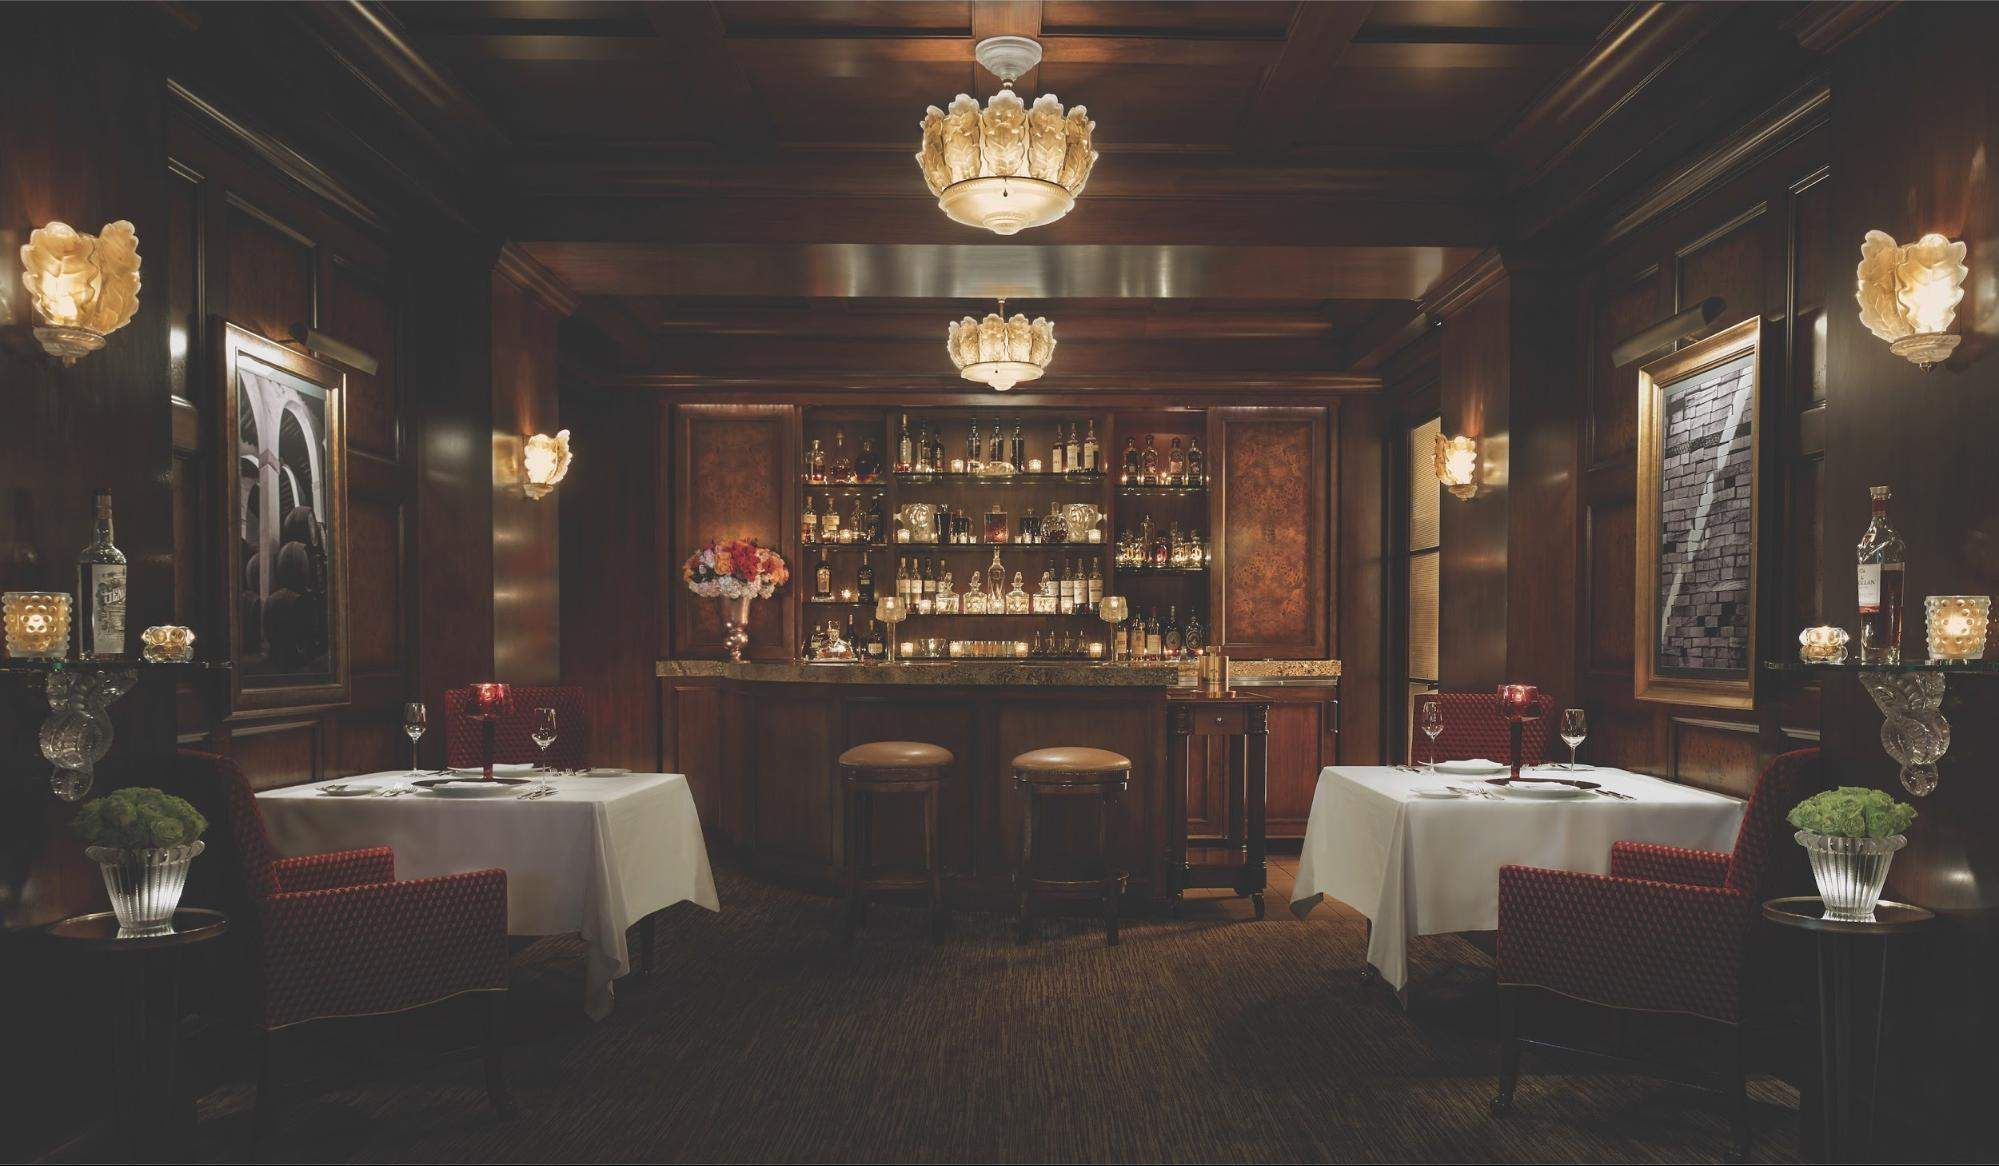 La S Best Secret Bars And How To Get Into All Of Them Secret Bar Hidden Bar Speakeasy Bar